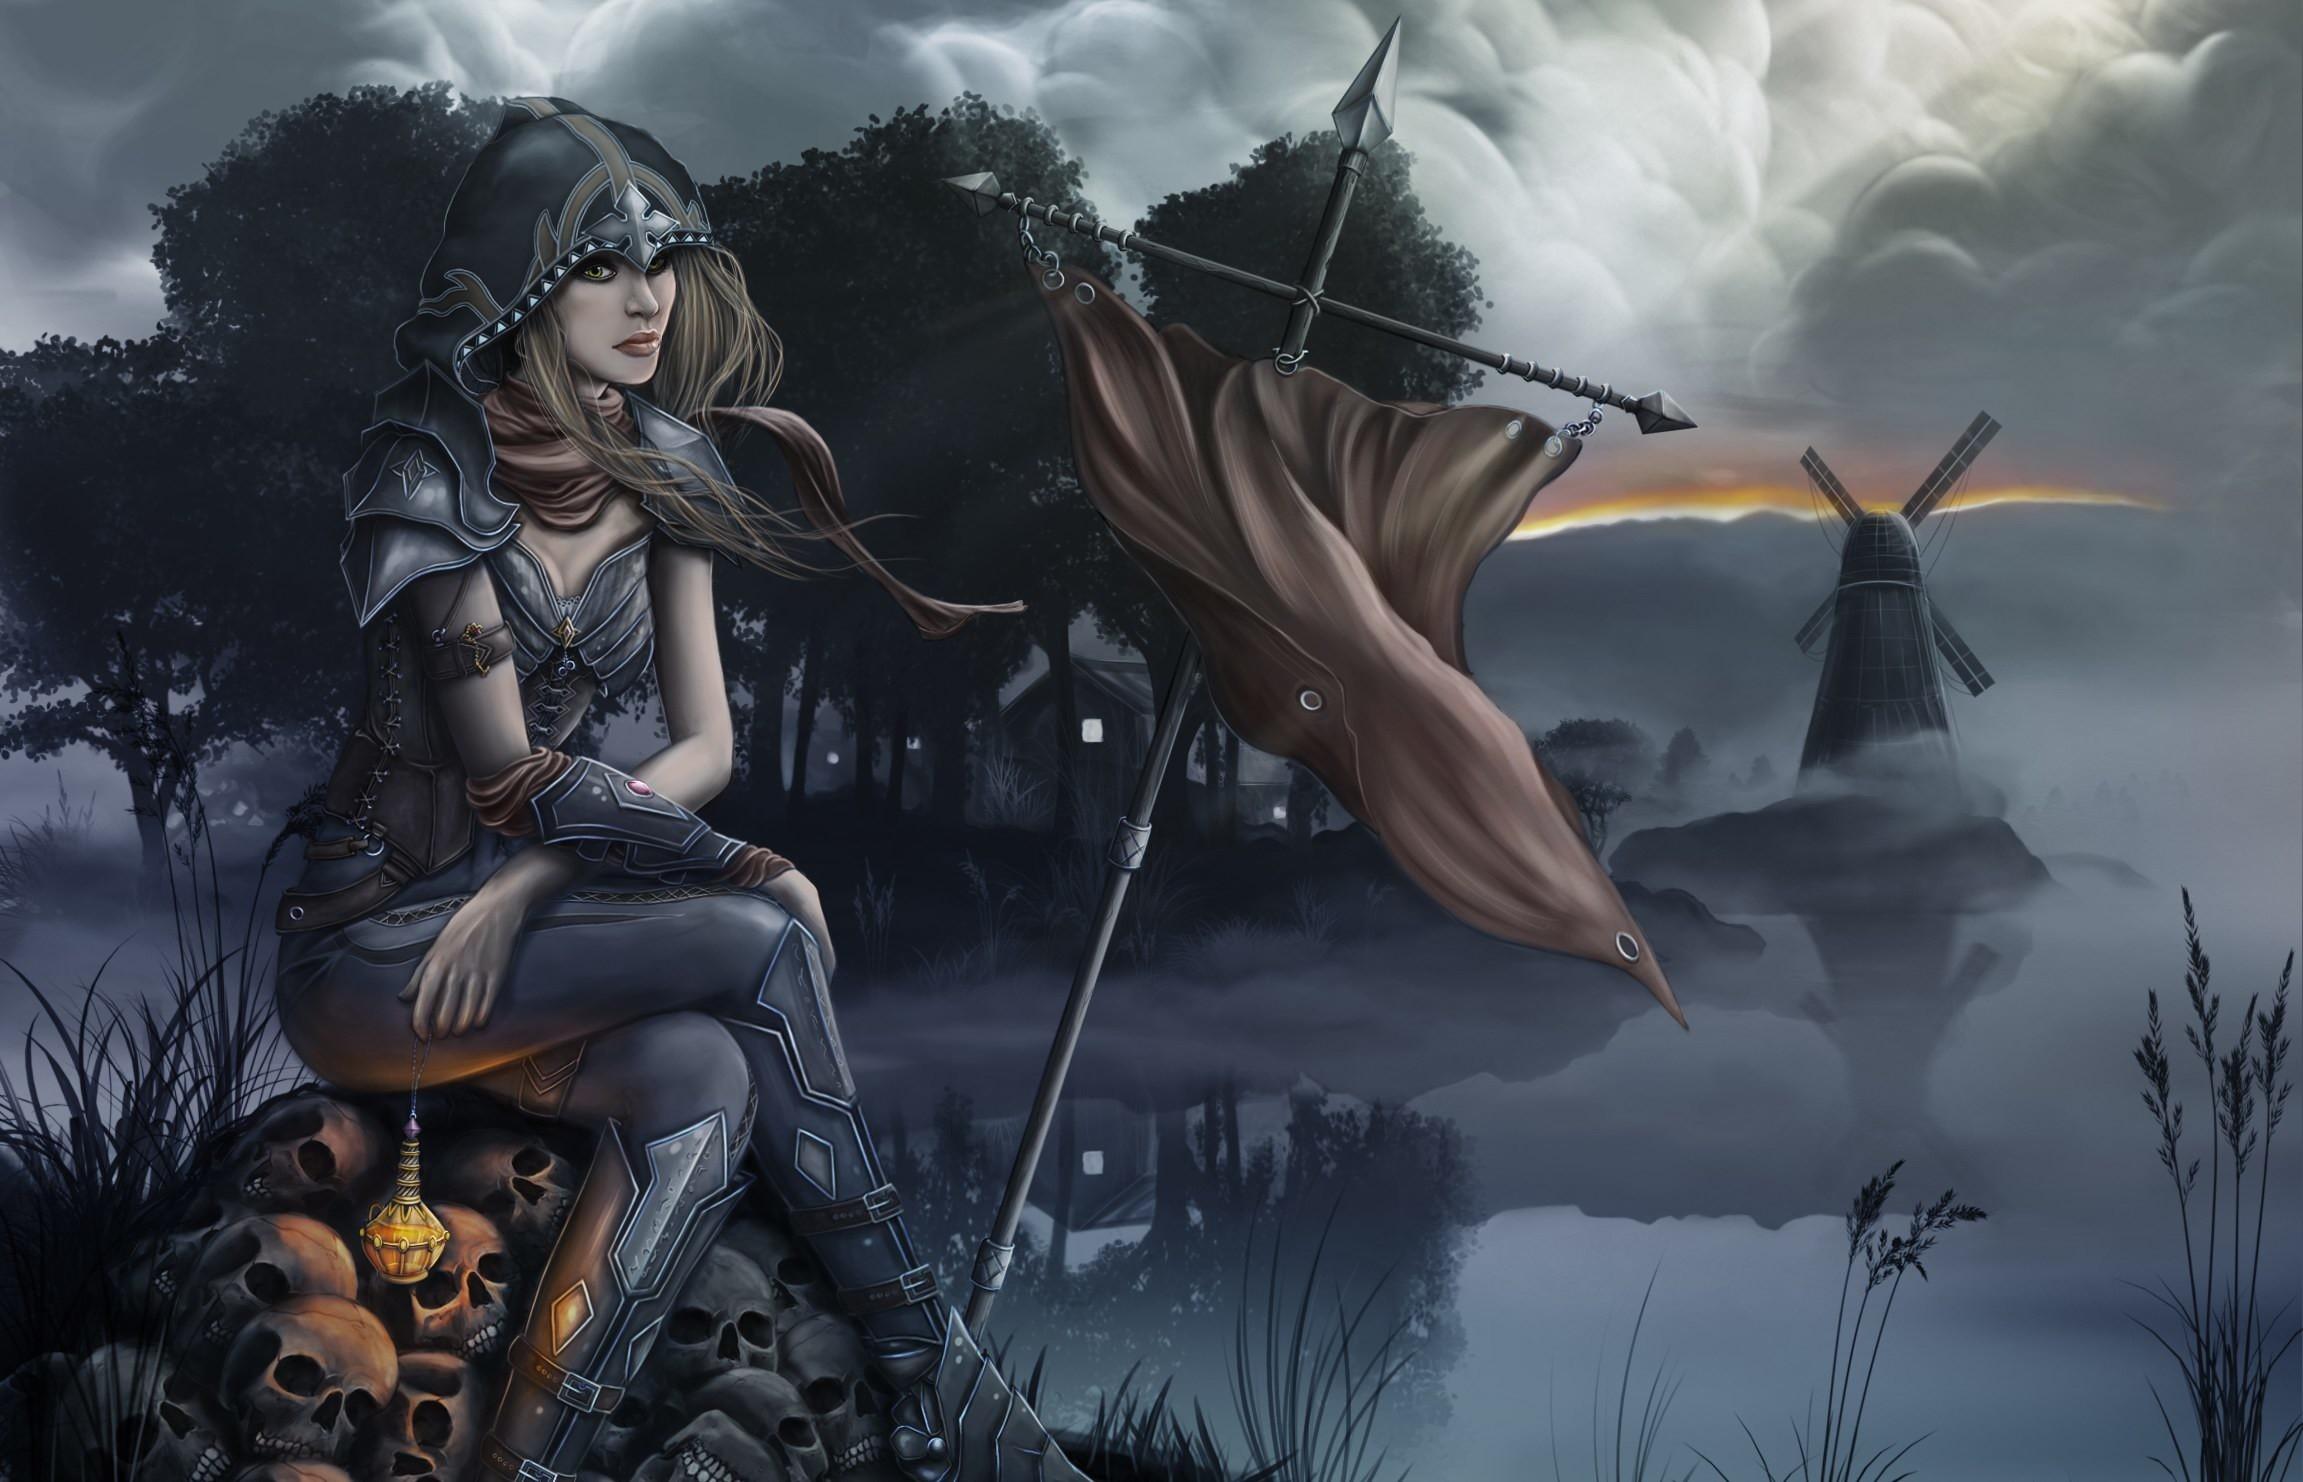 Res: 2303x1482, Female-demon-hunter-diablo-3.jpg